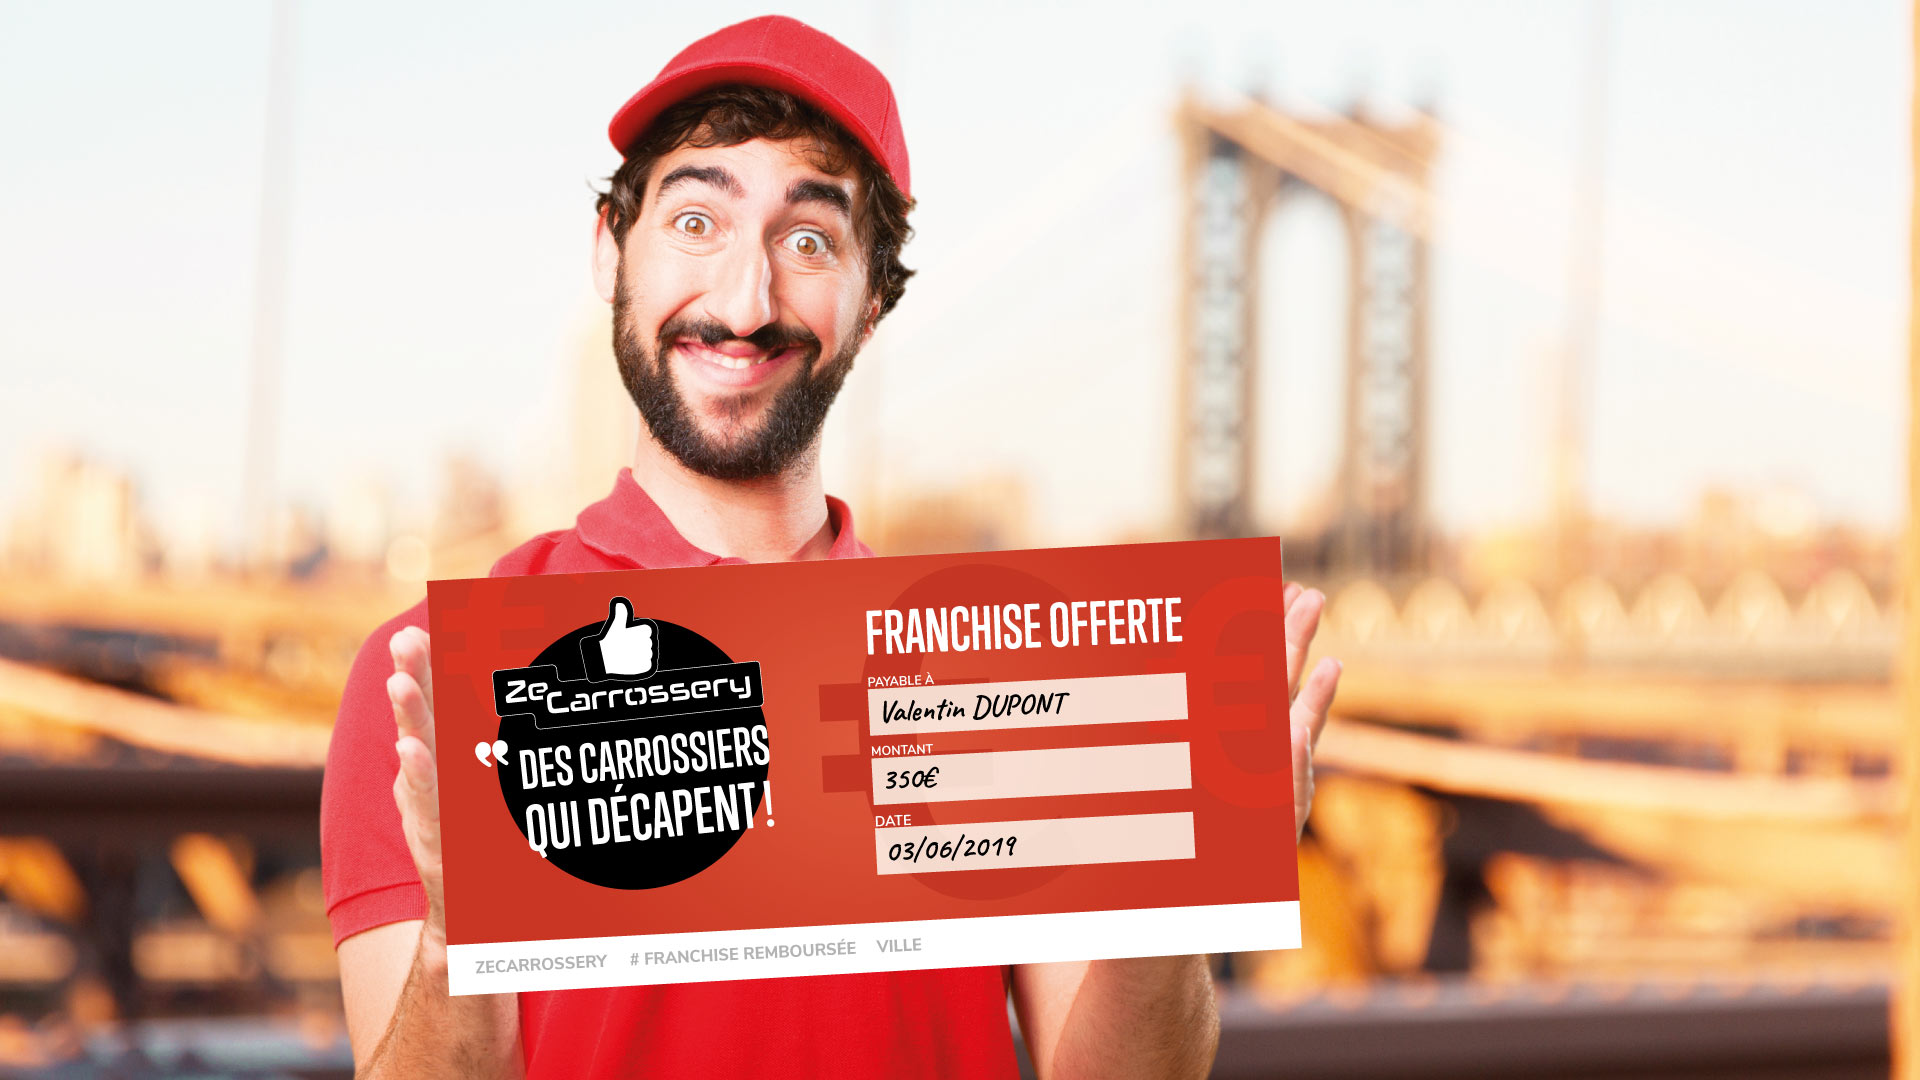 offre franchise offerte